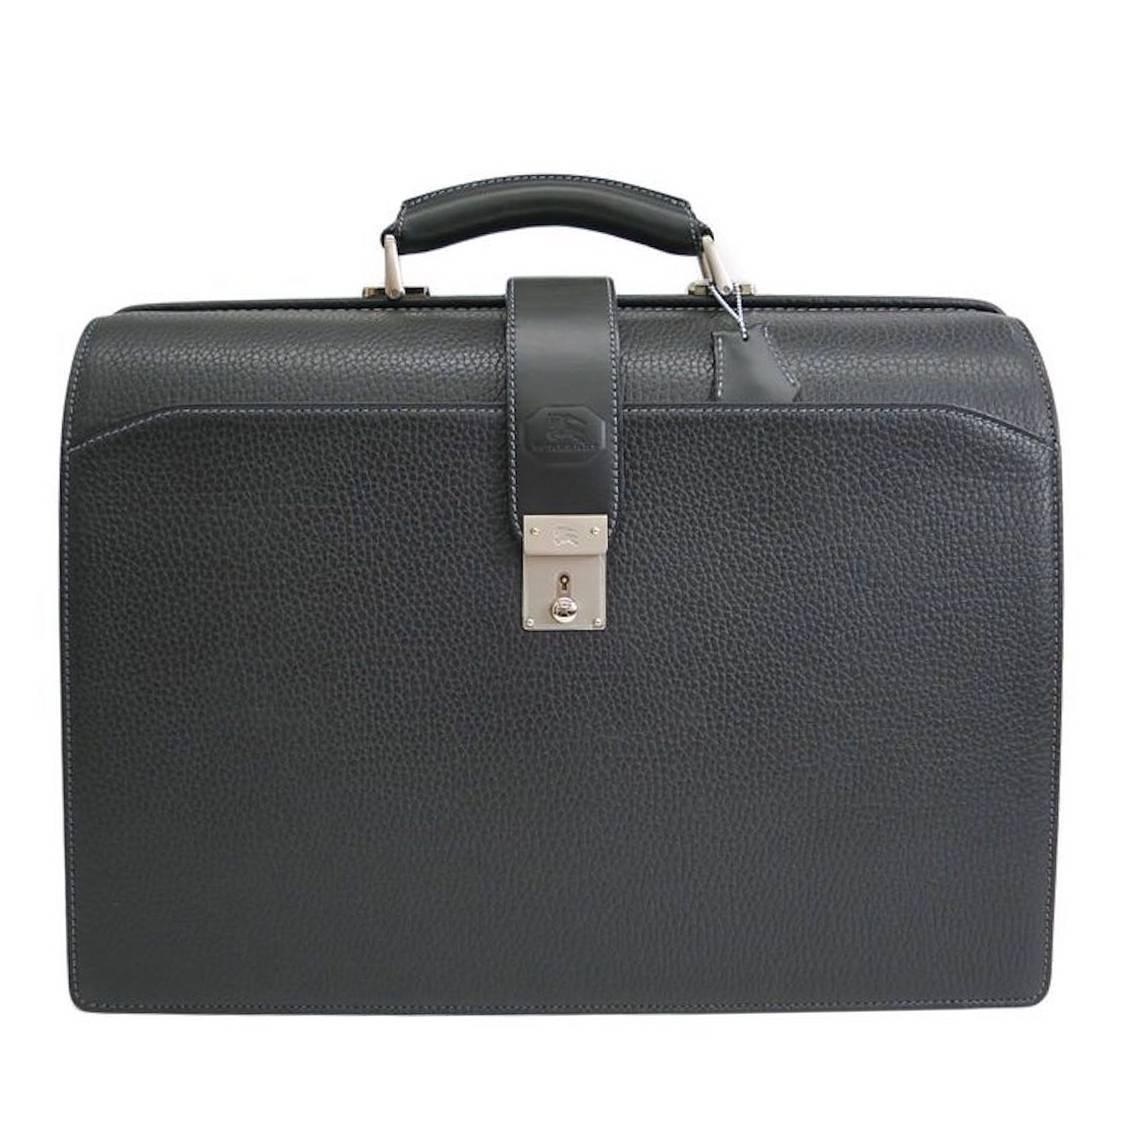 Burberry Black Leather Palladium Men S Attache Briefcase